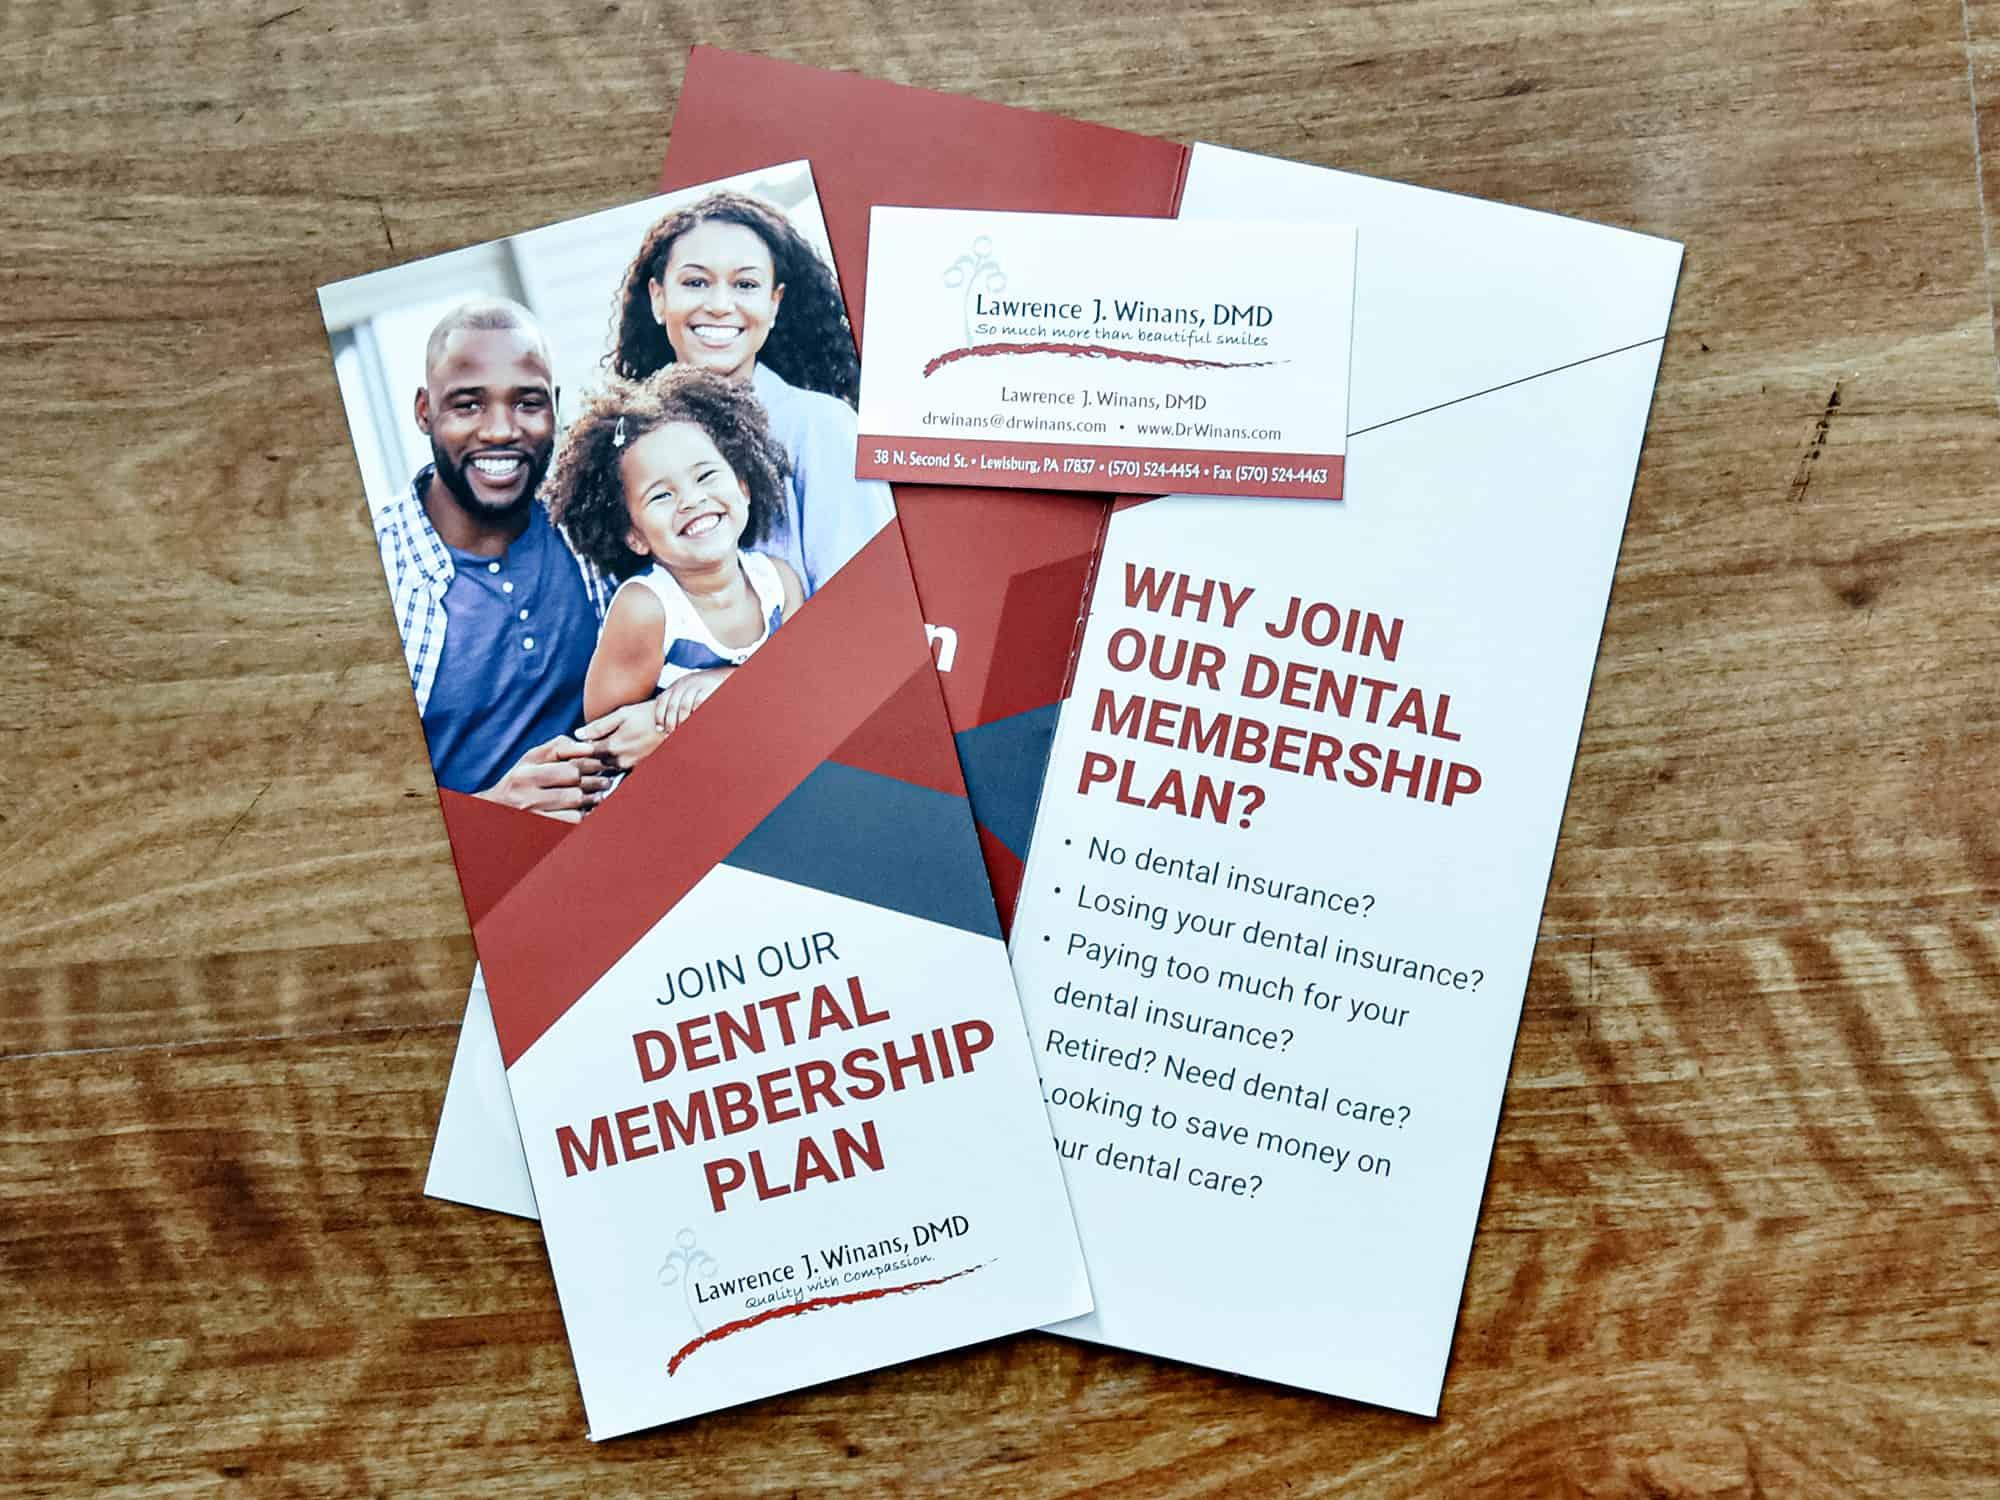 brochure for dental membership plan on table